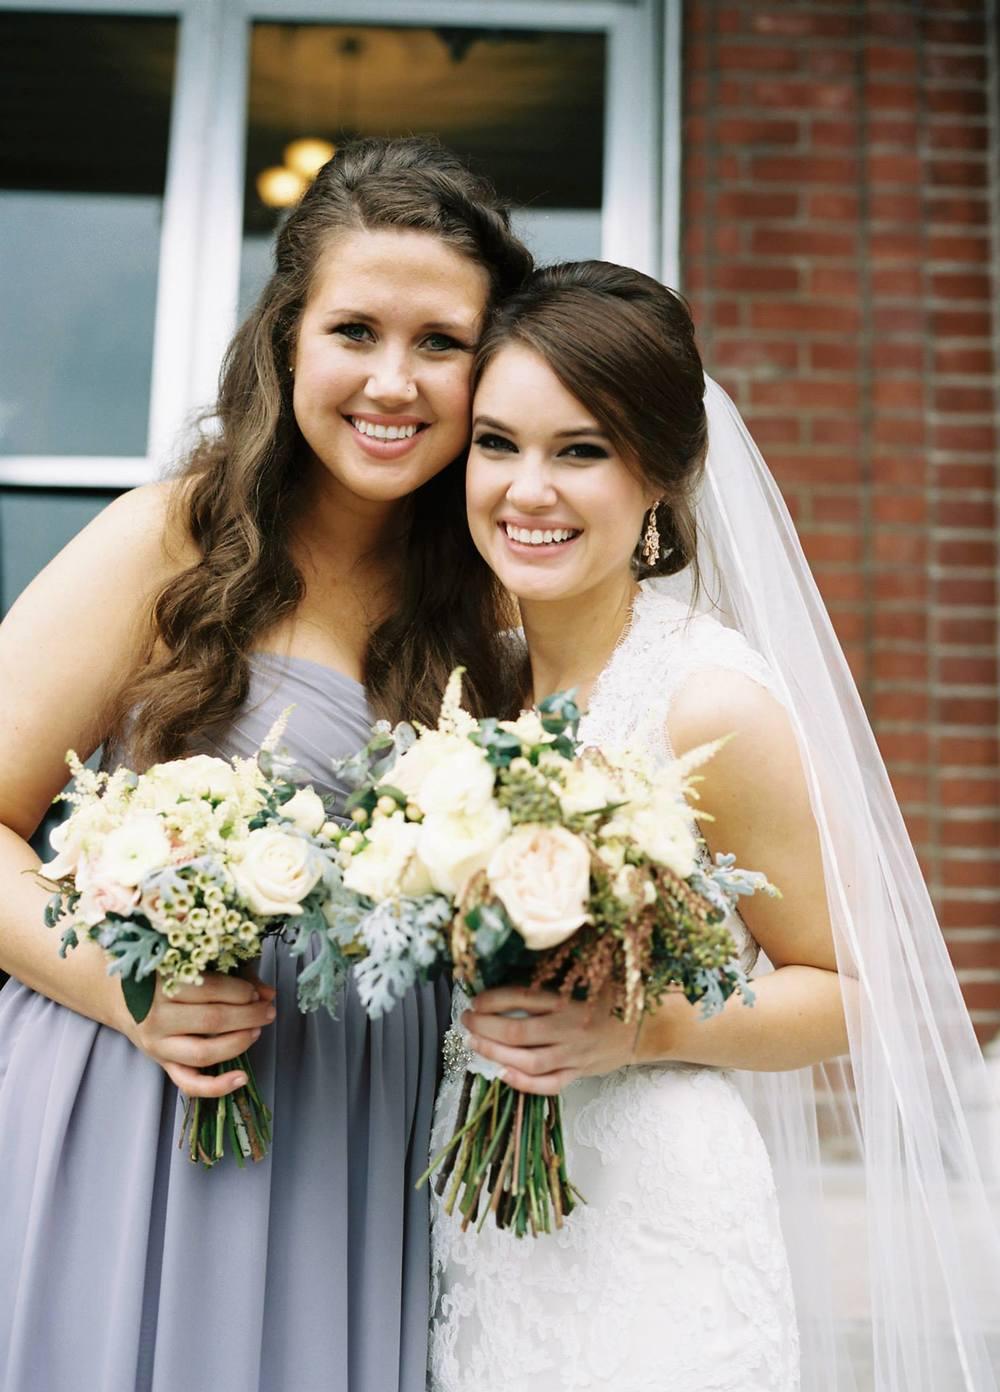 Nashville Wedding Floral Design // Bridesmaid Bouquet